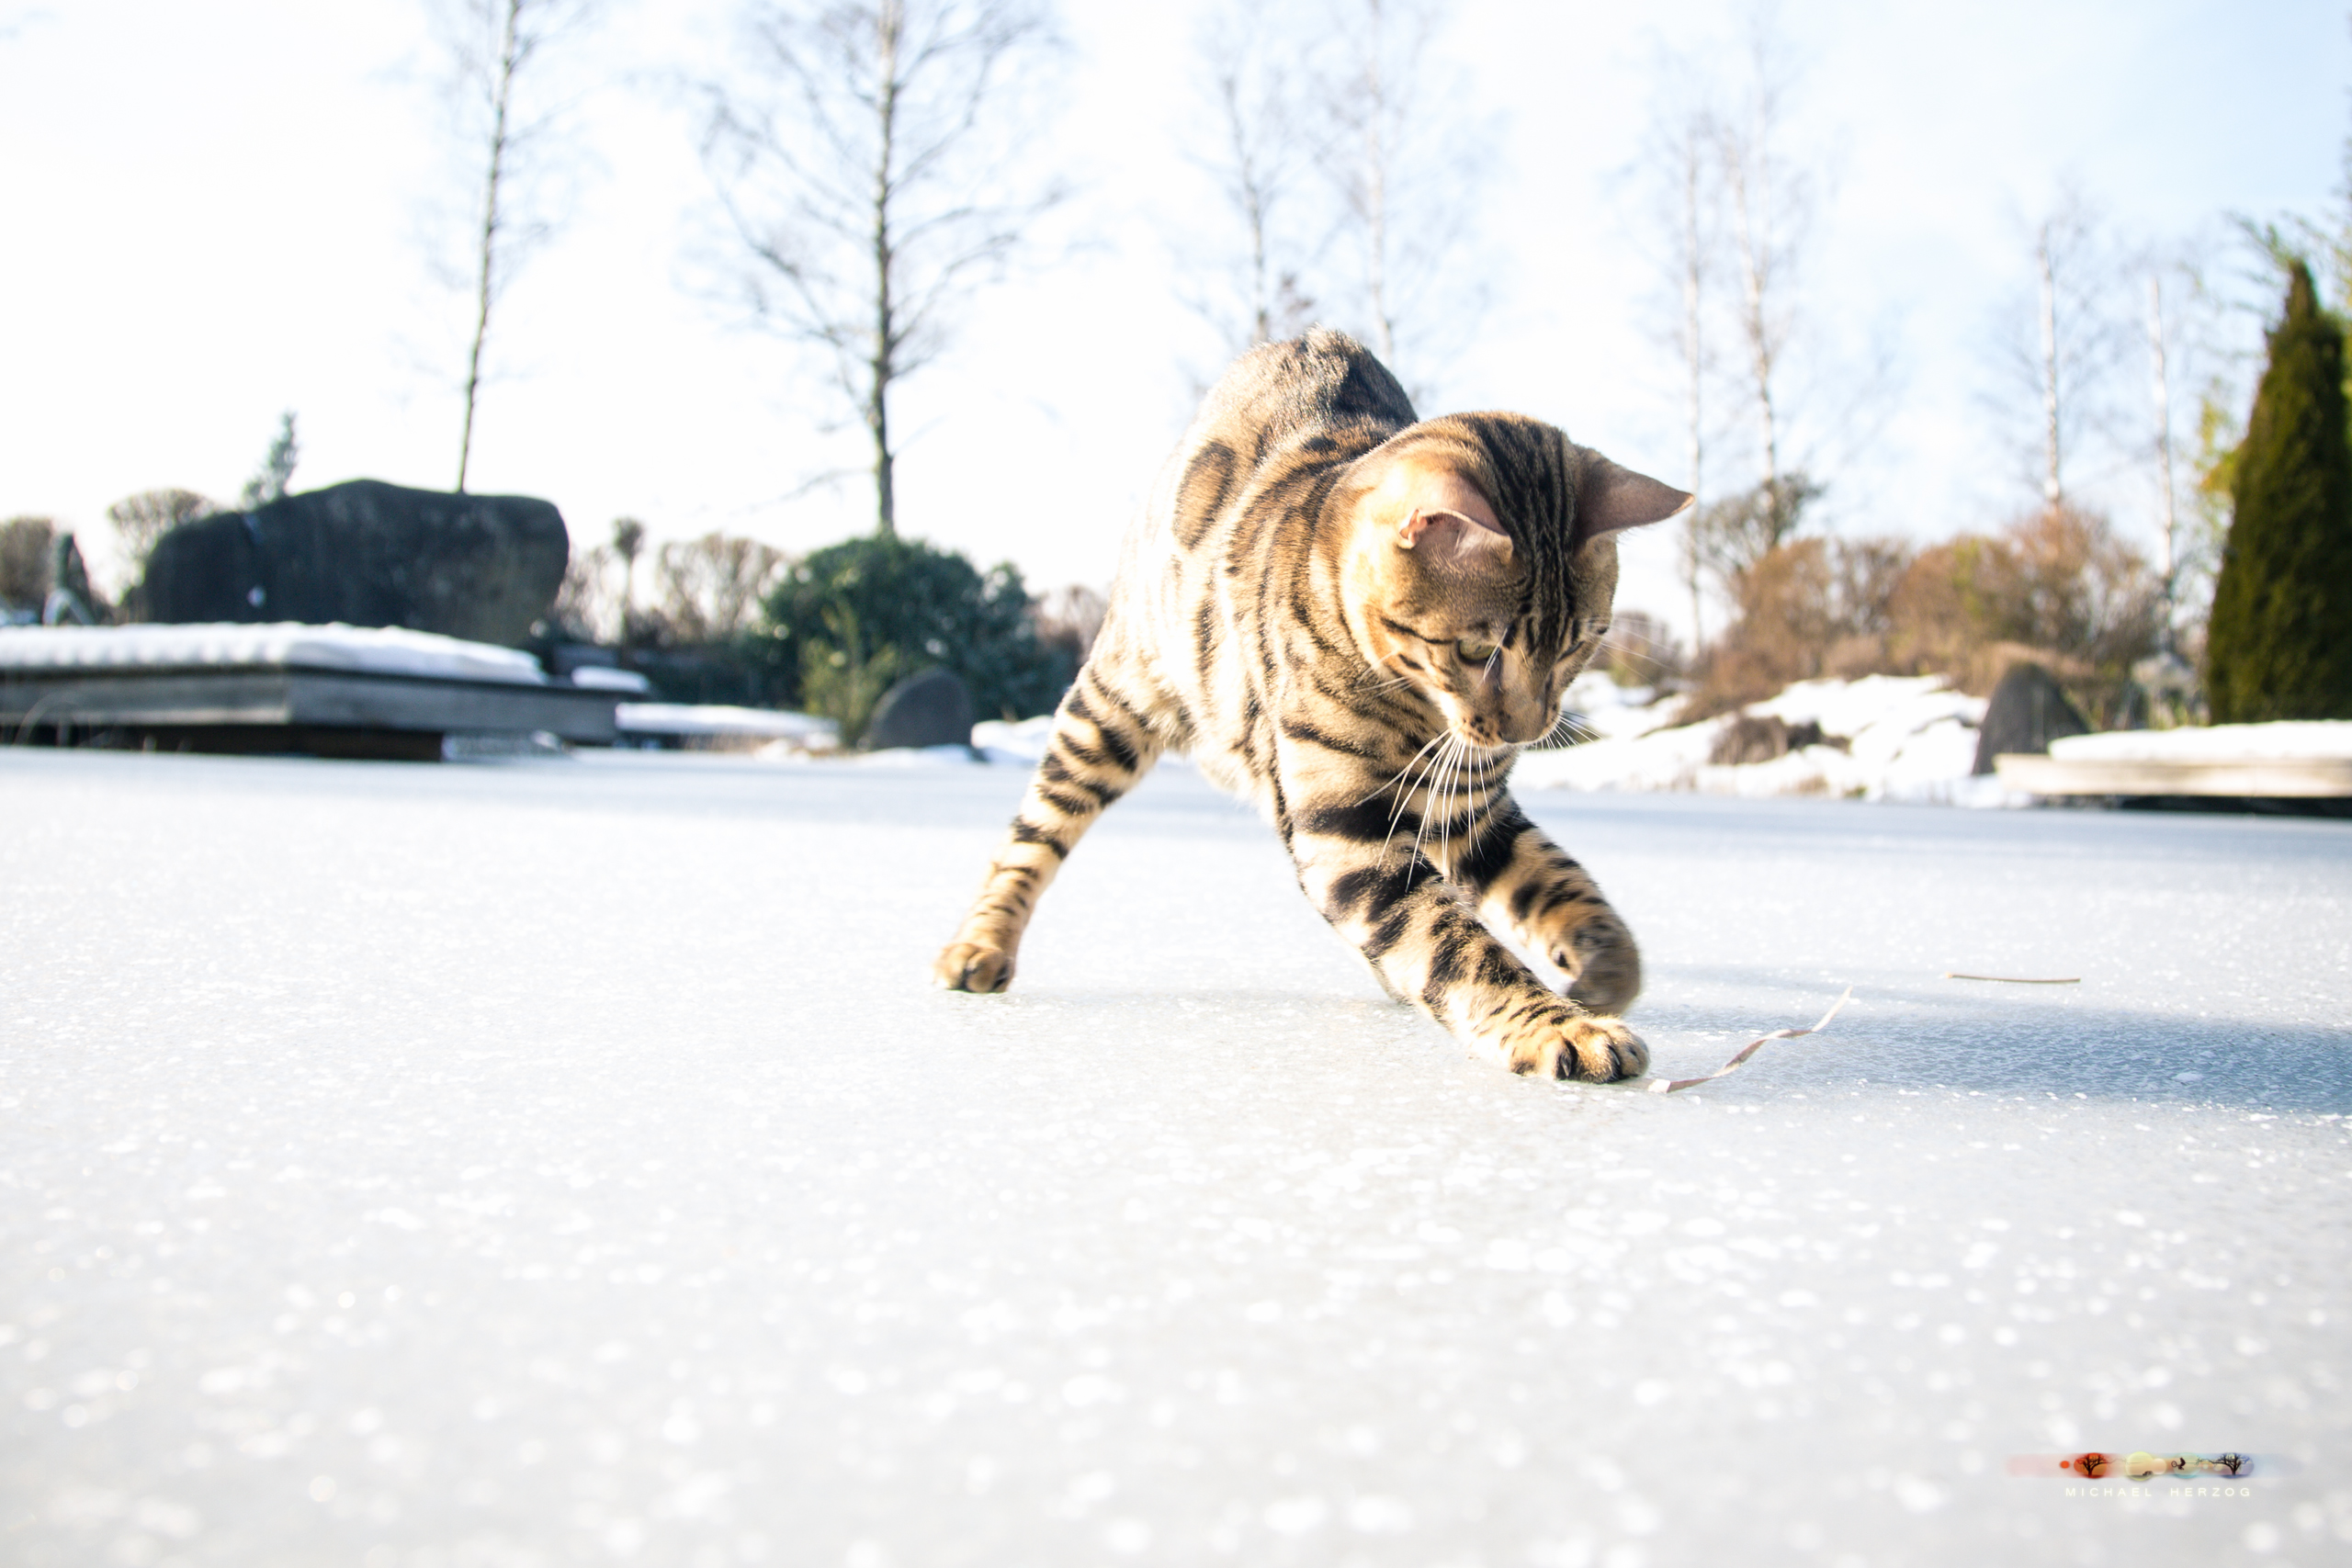 BALUARI_Winter2019_Garten_MichaelHerzog-8956.jpg